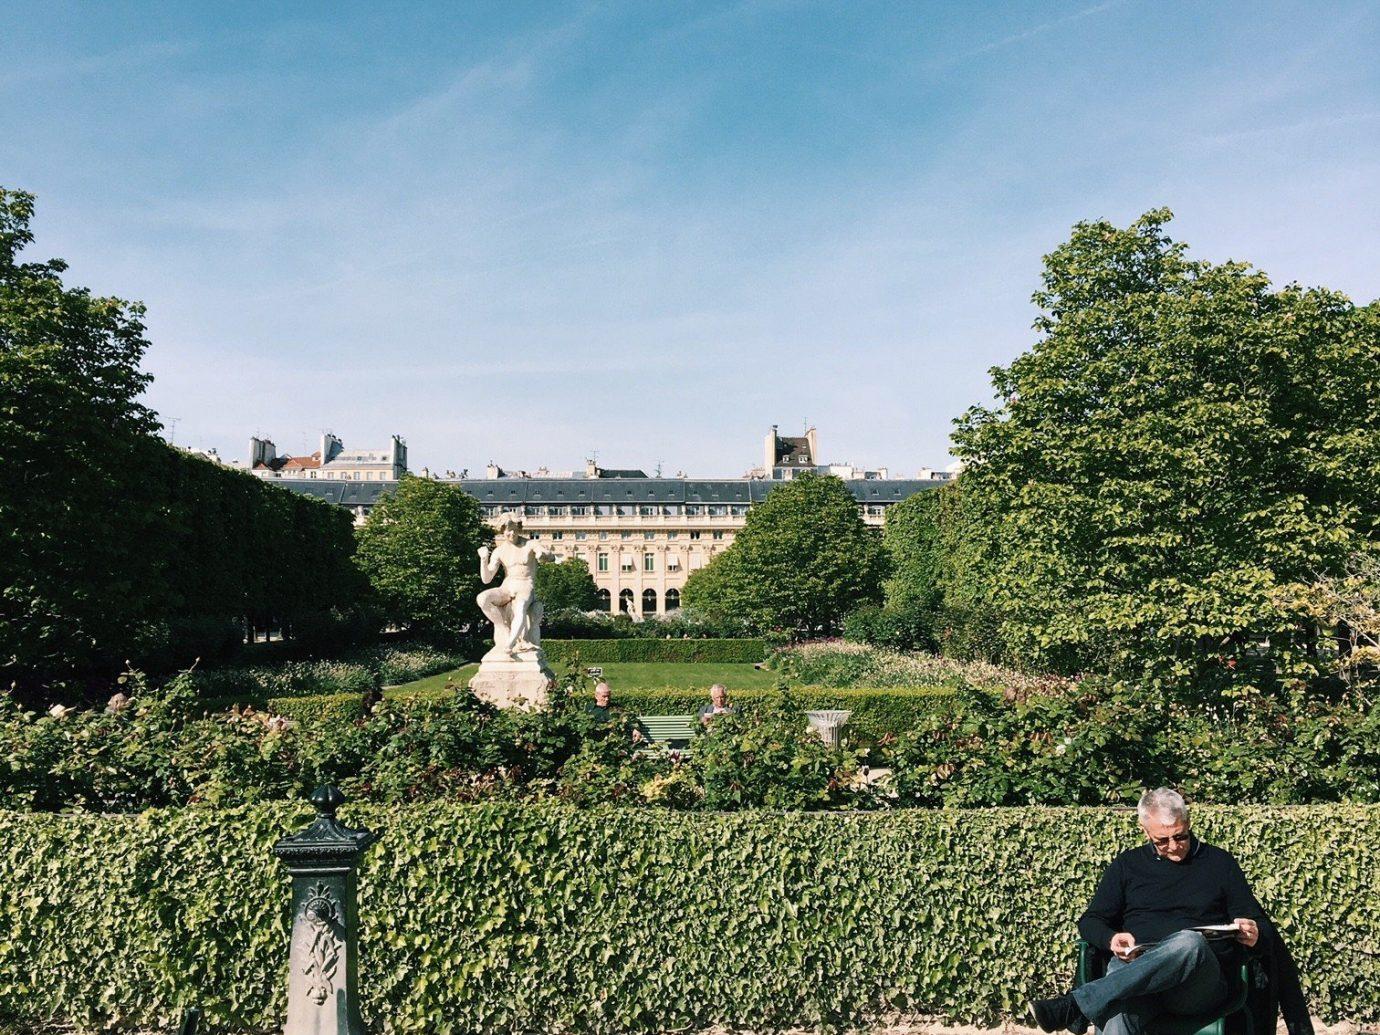 France Paris Trip Ideas sky tree outdoor vacation plant tourism park travel Garden